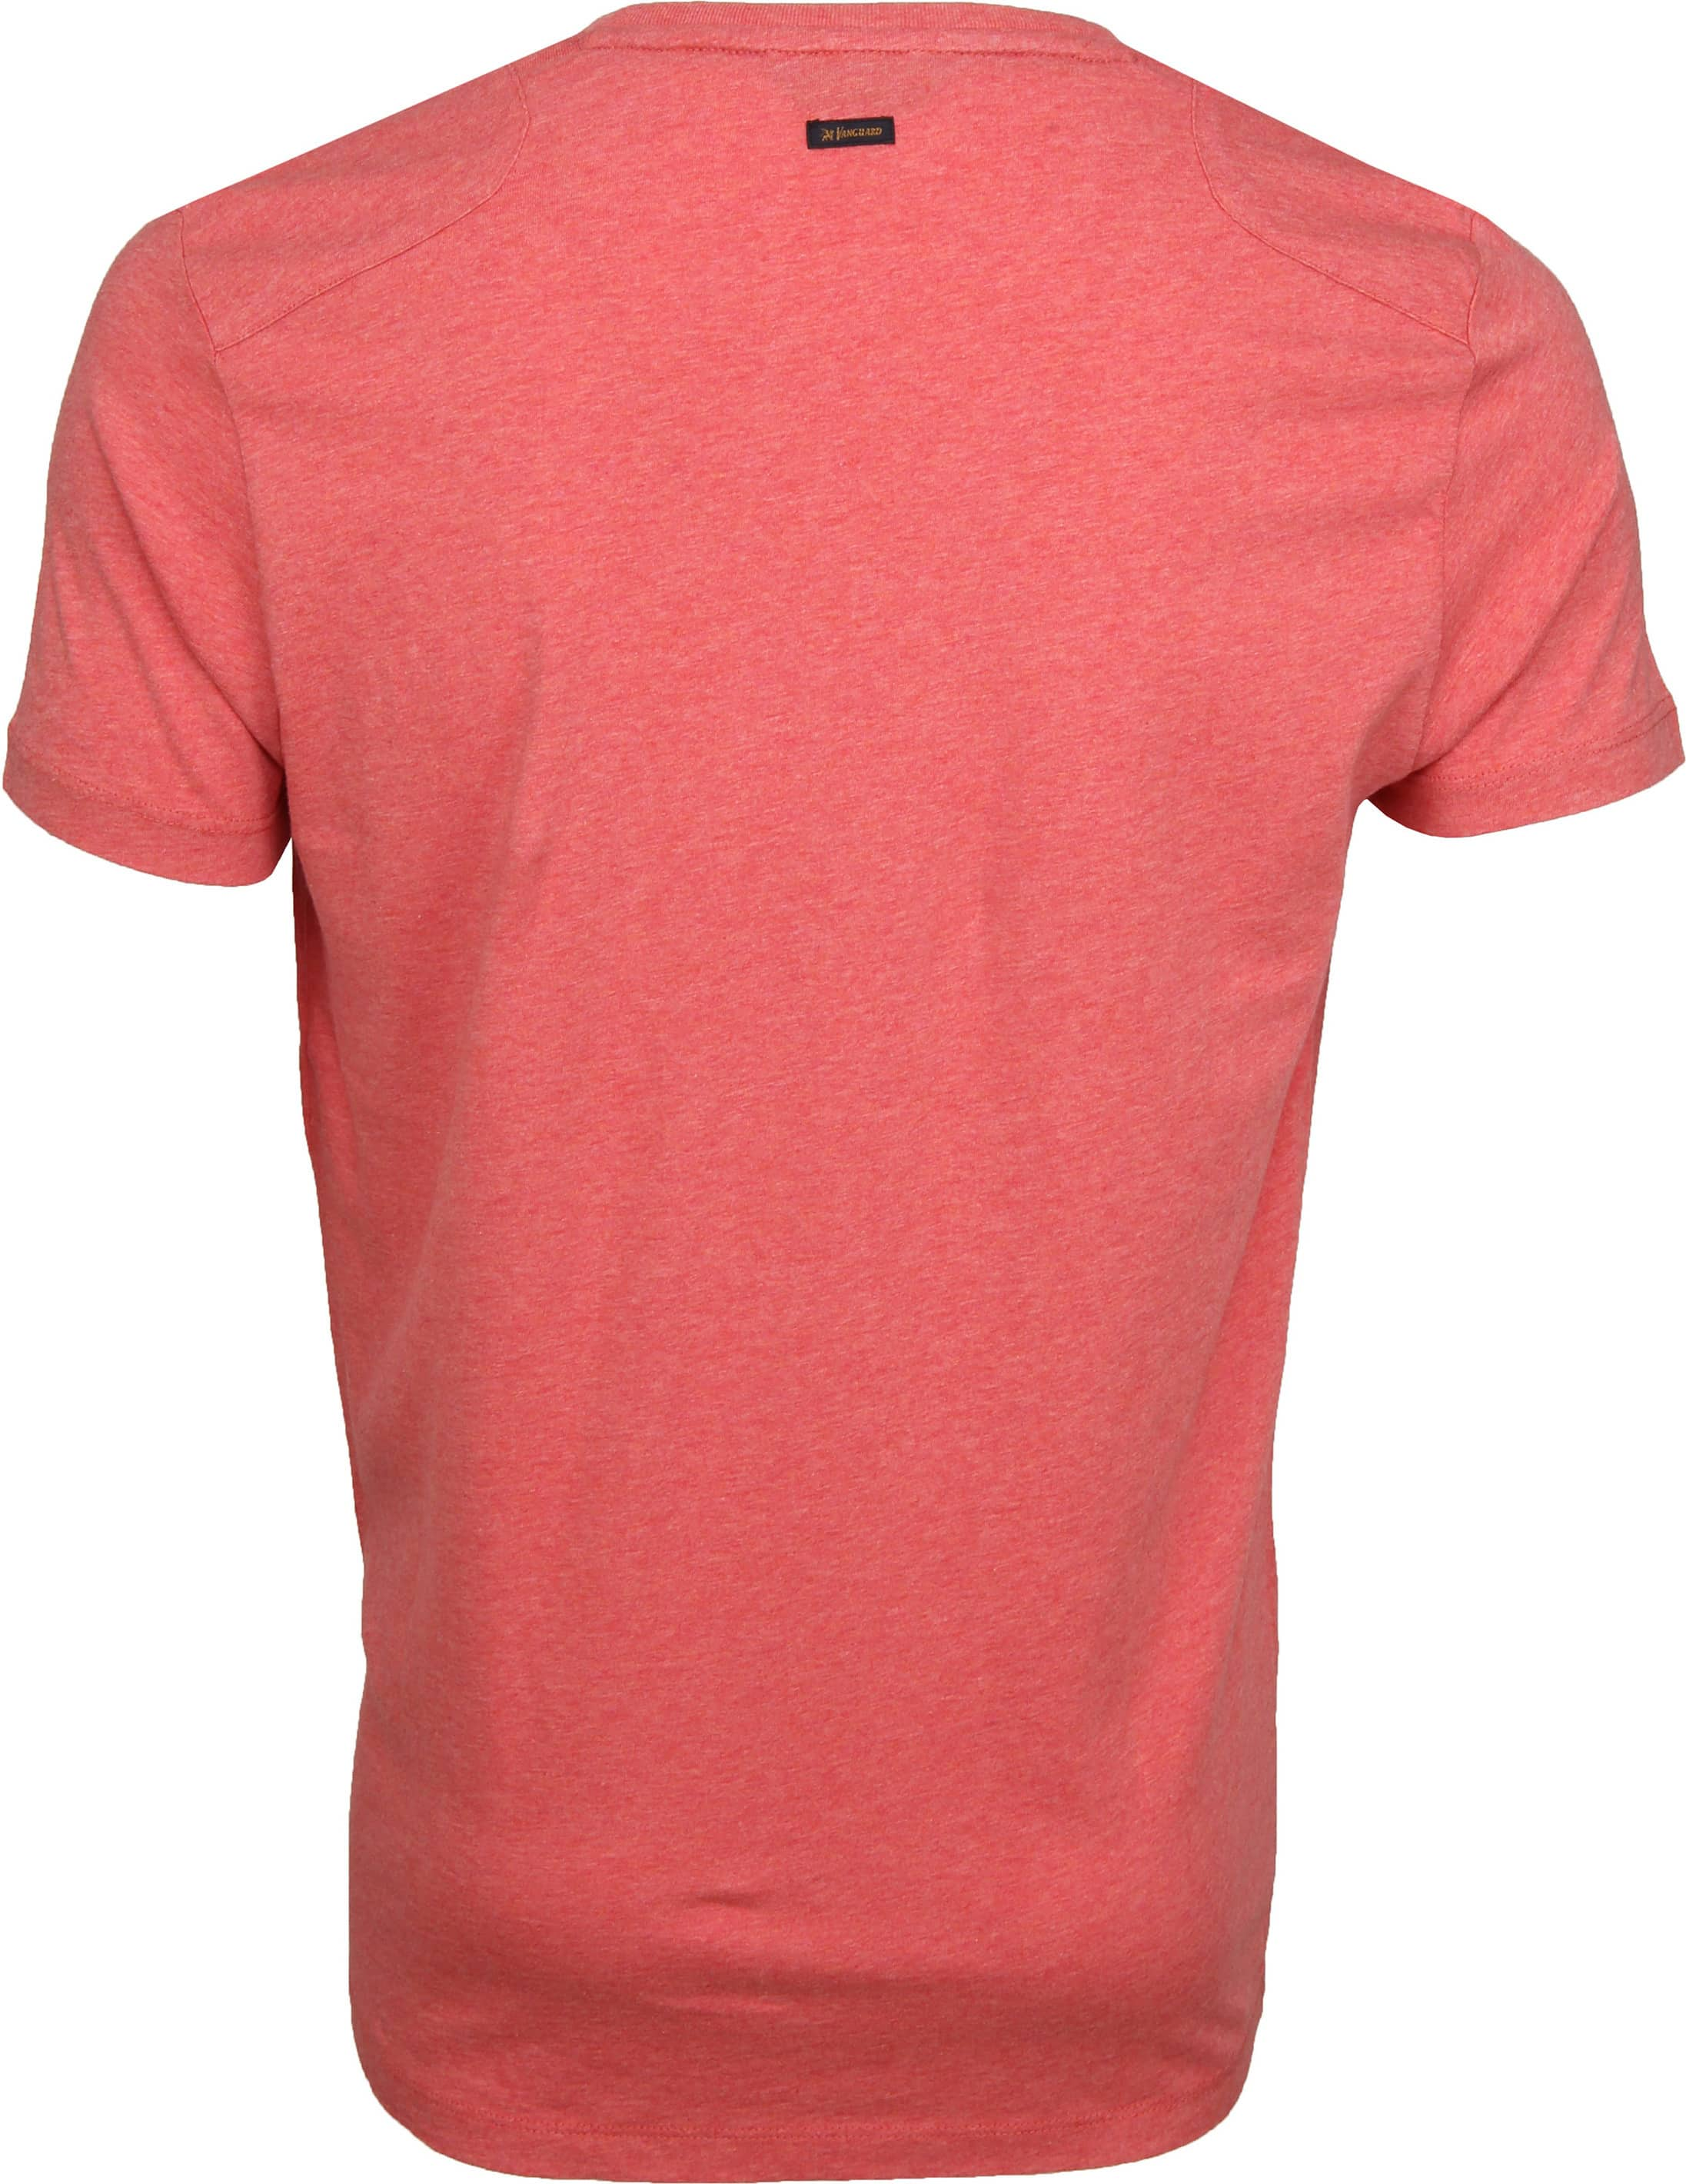 Vanguard T-shirt Print Pompeian Rood foto 2